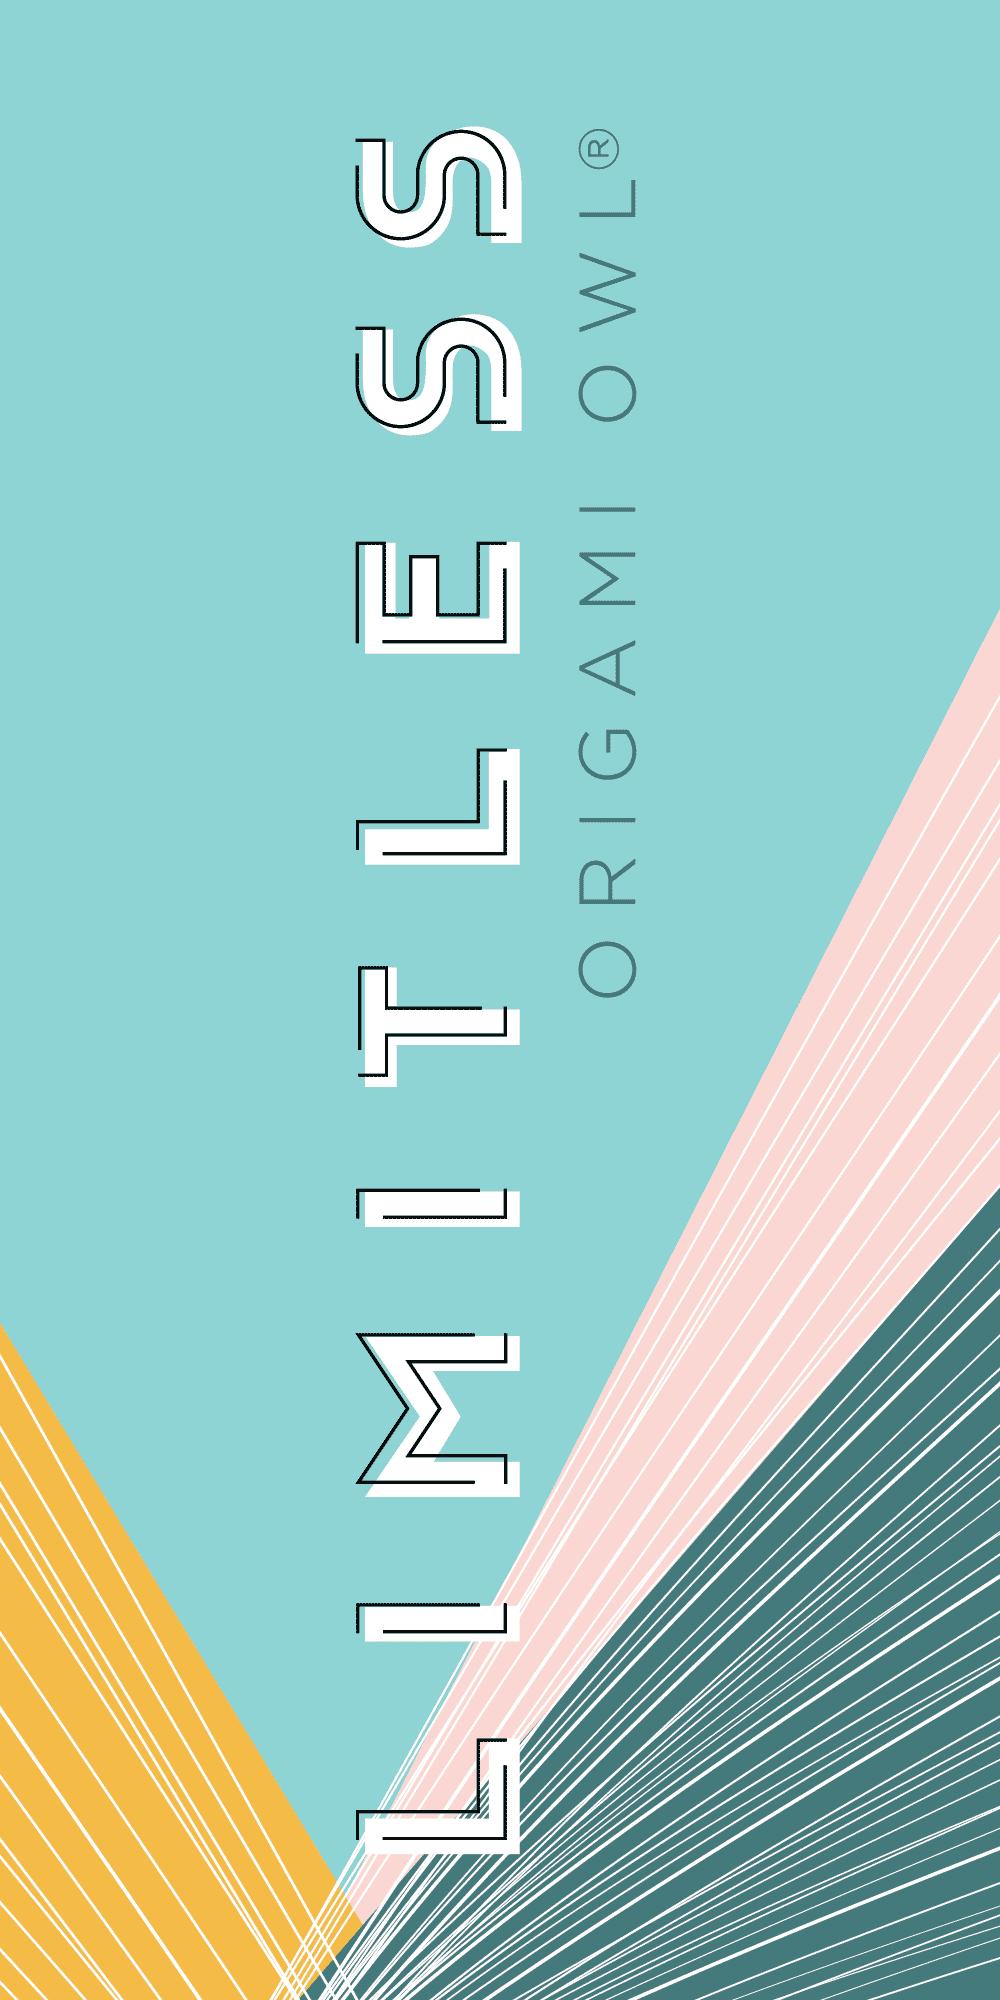 Origami Owl 2019 Convention wayfinder trio sign, right panel